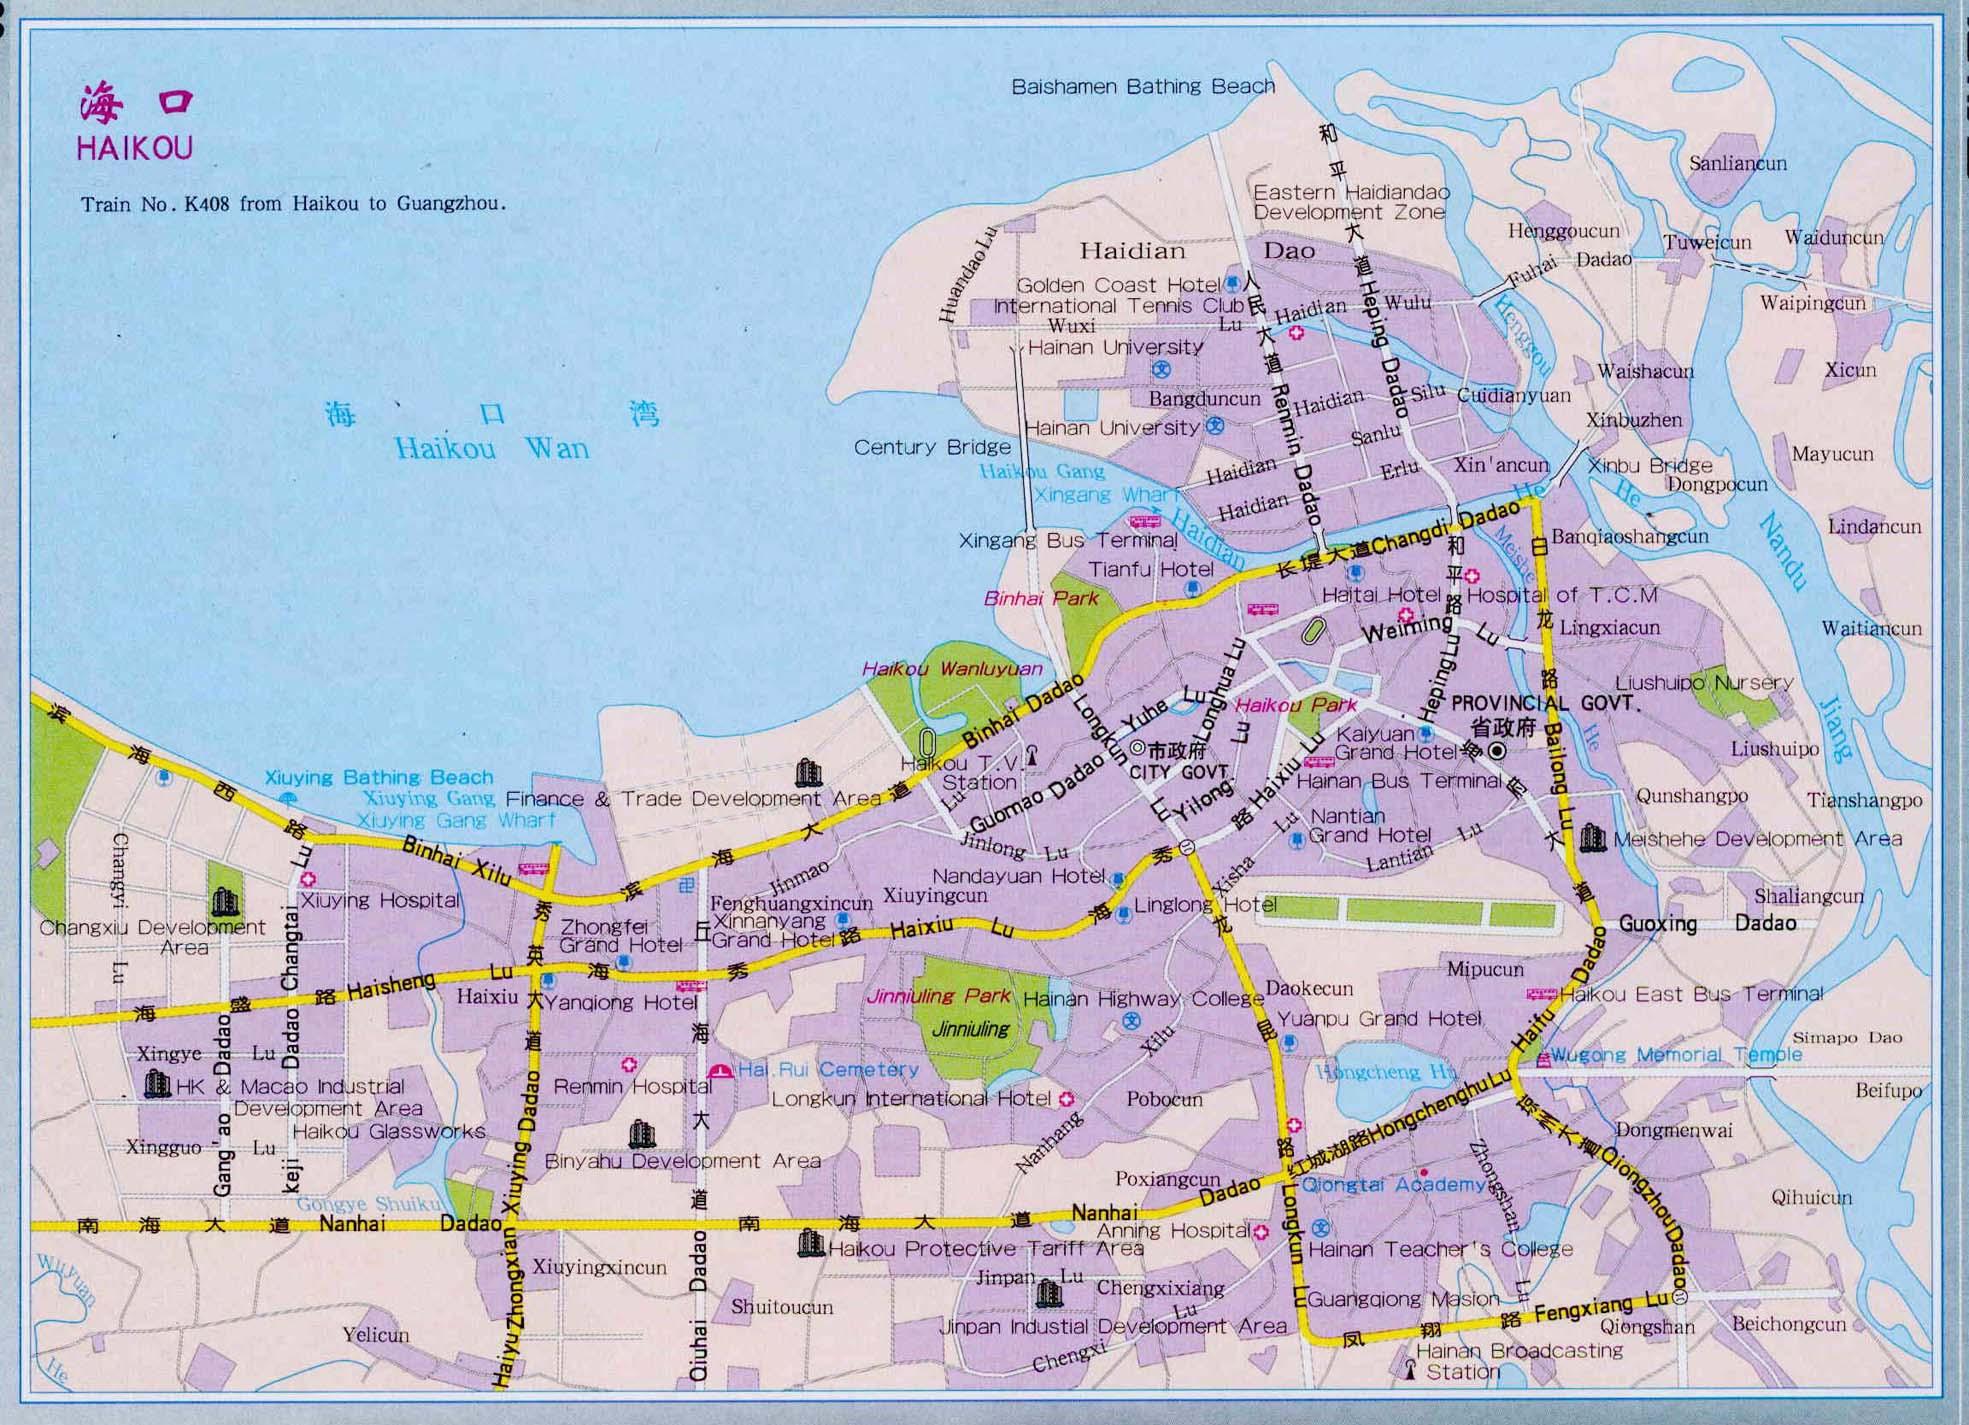 Haikou China  City new picture : Haikou Map, Map of Haikou China, Haikou City, Tourist Map